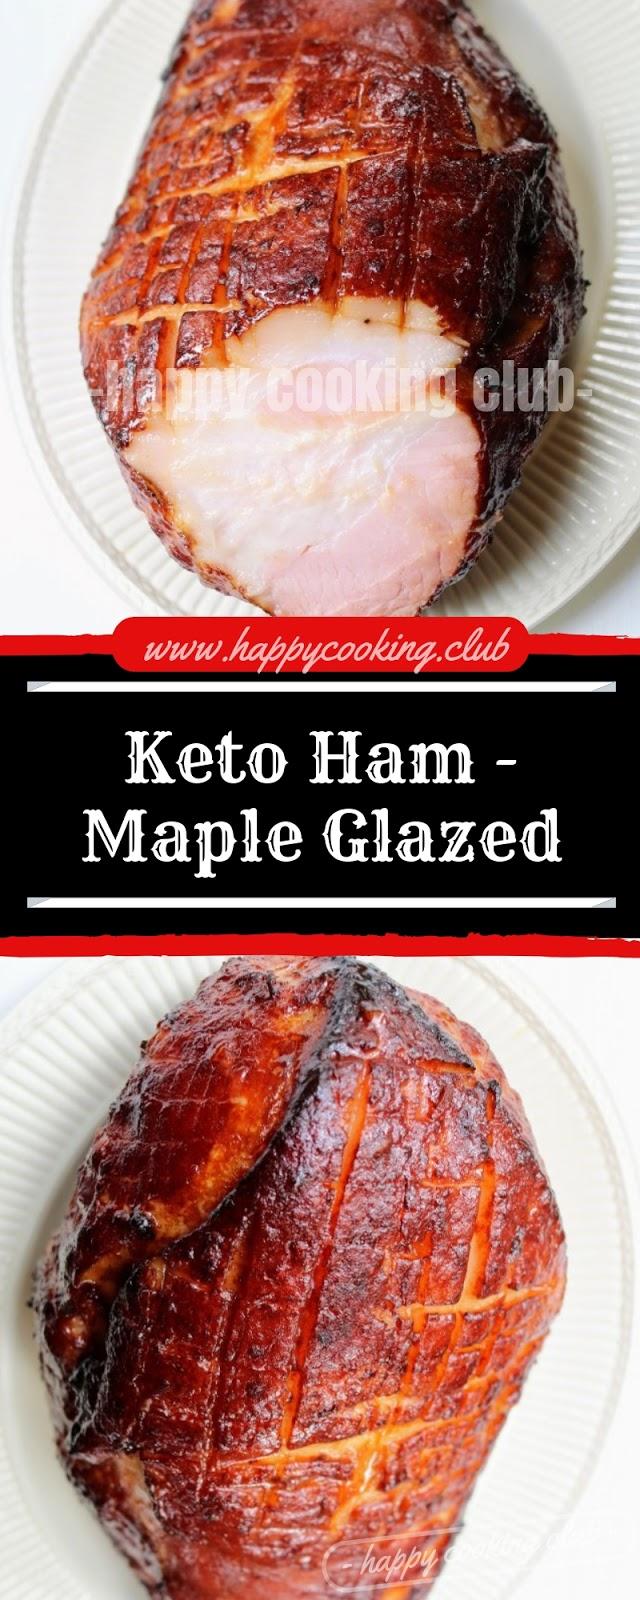 Keto Ham - Maple Glazed